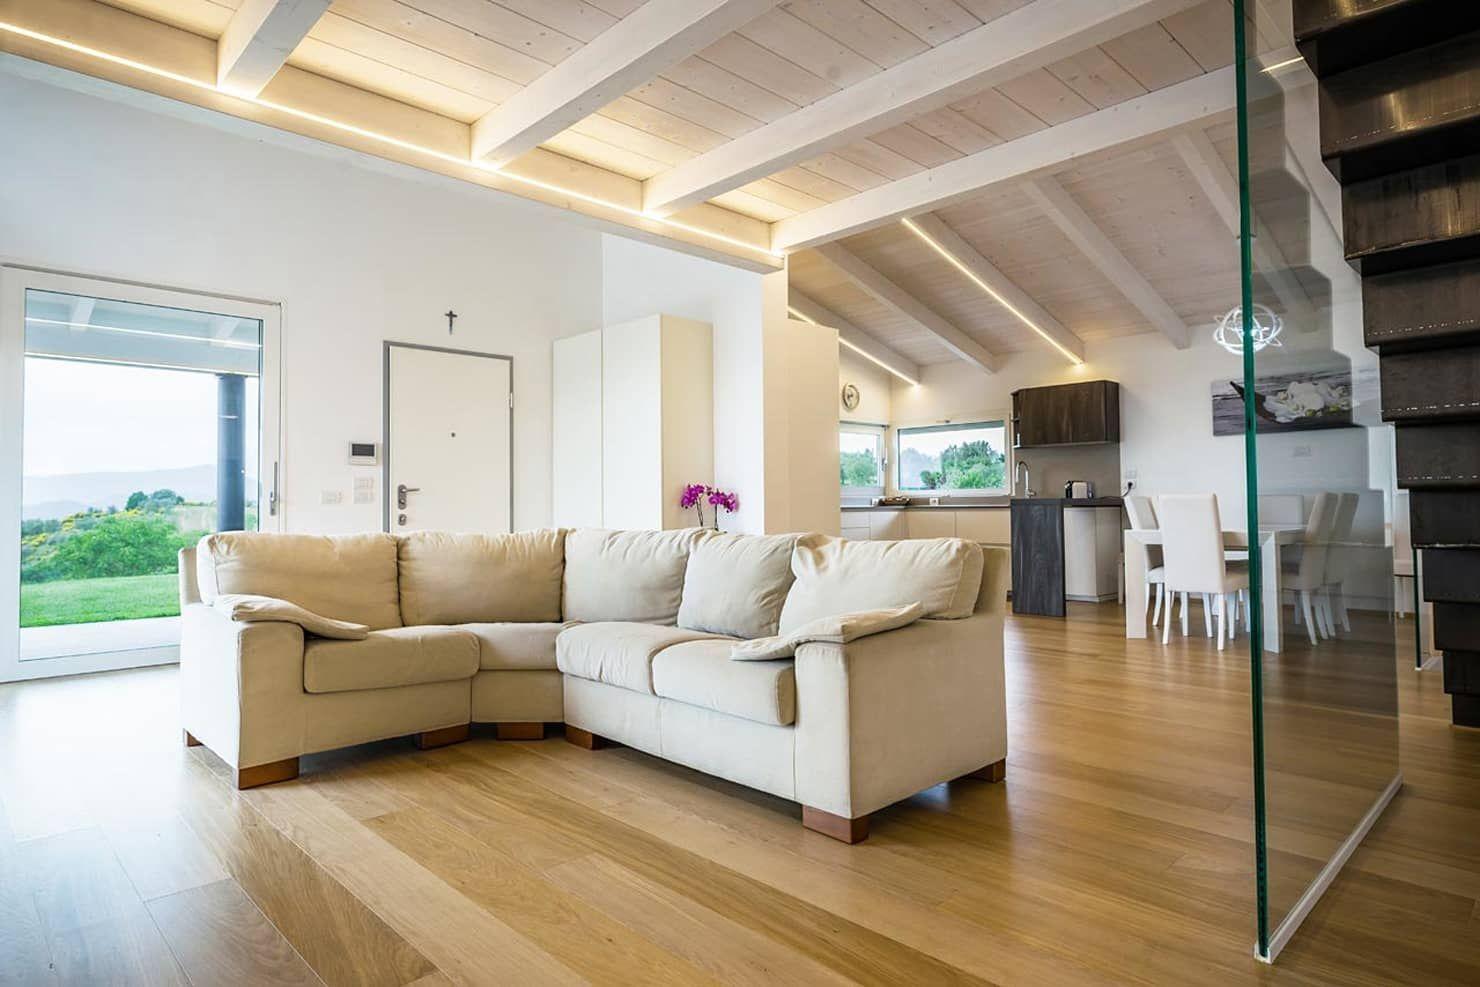 Casa Di Legno Costi casa in legno perugia di costantini case in legno   case di